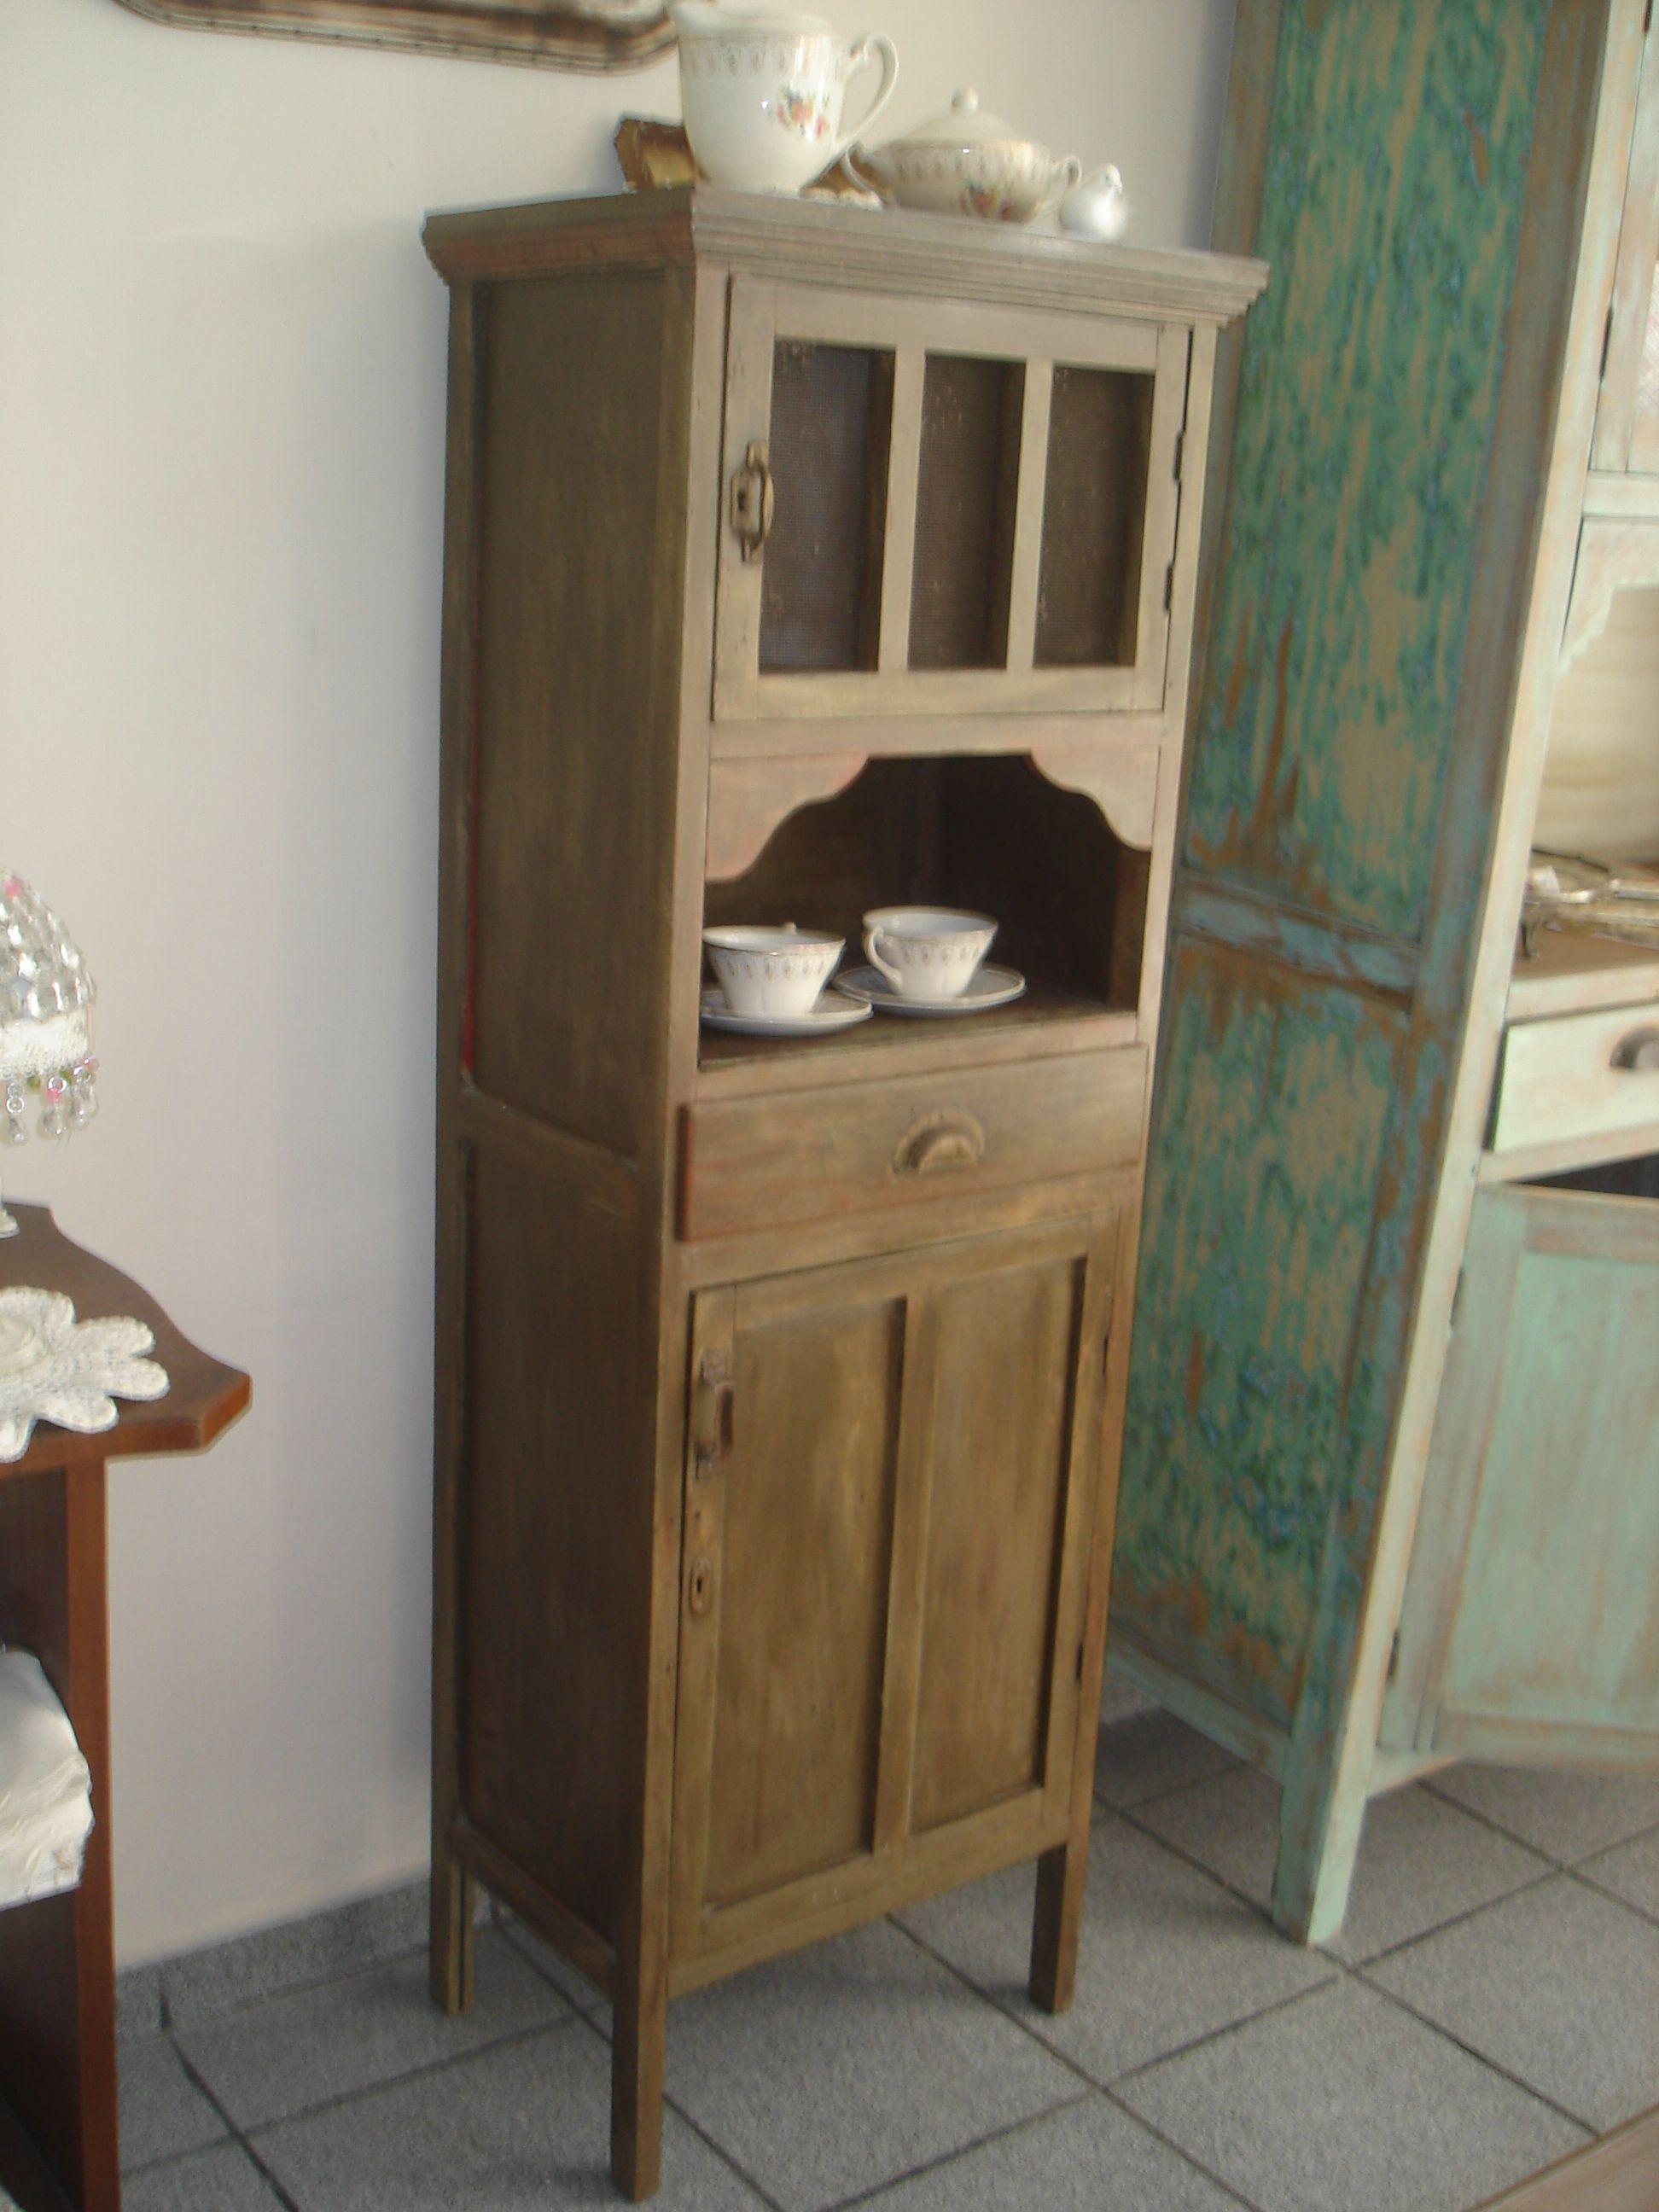 Petit mueble de campo a os 40 muebles de campo for Muebles para casa de campo